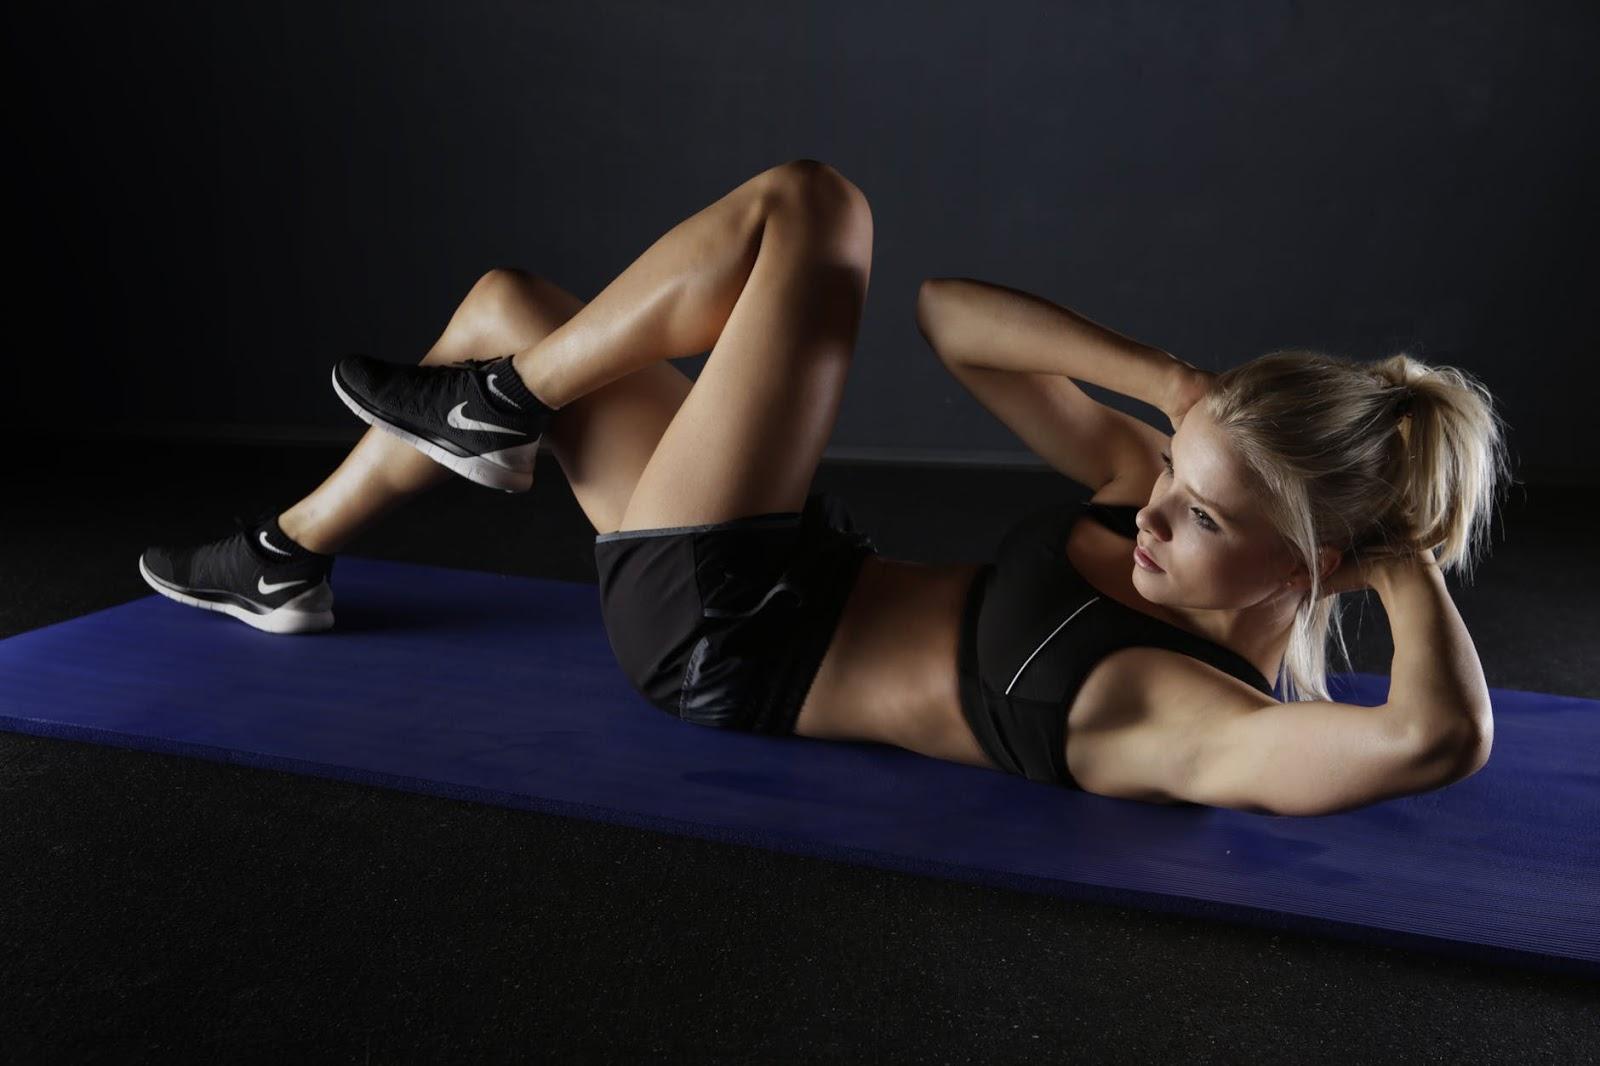 Ce trebuie sa contina o tinuta potrivita pentru sport?